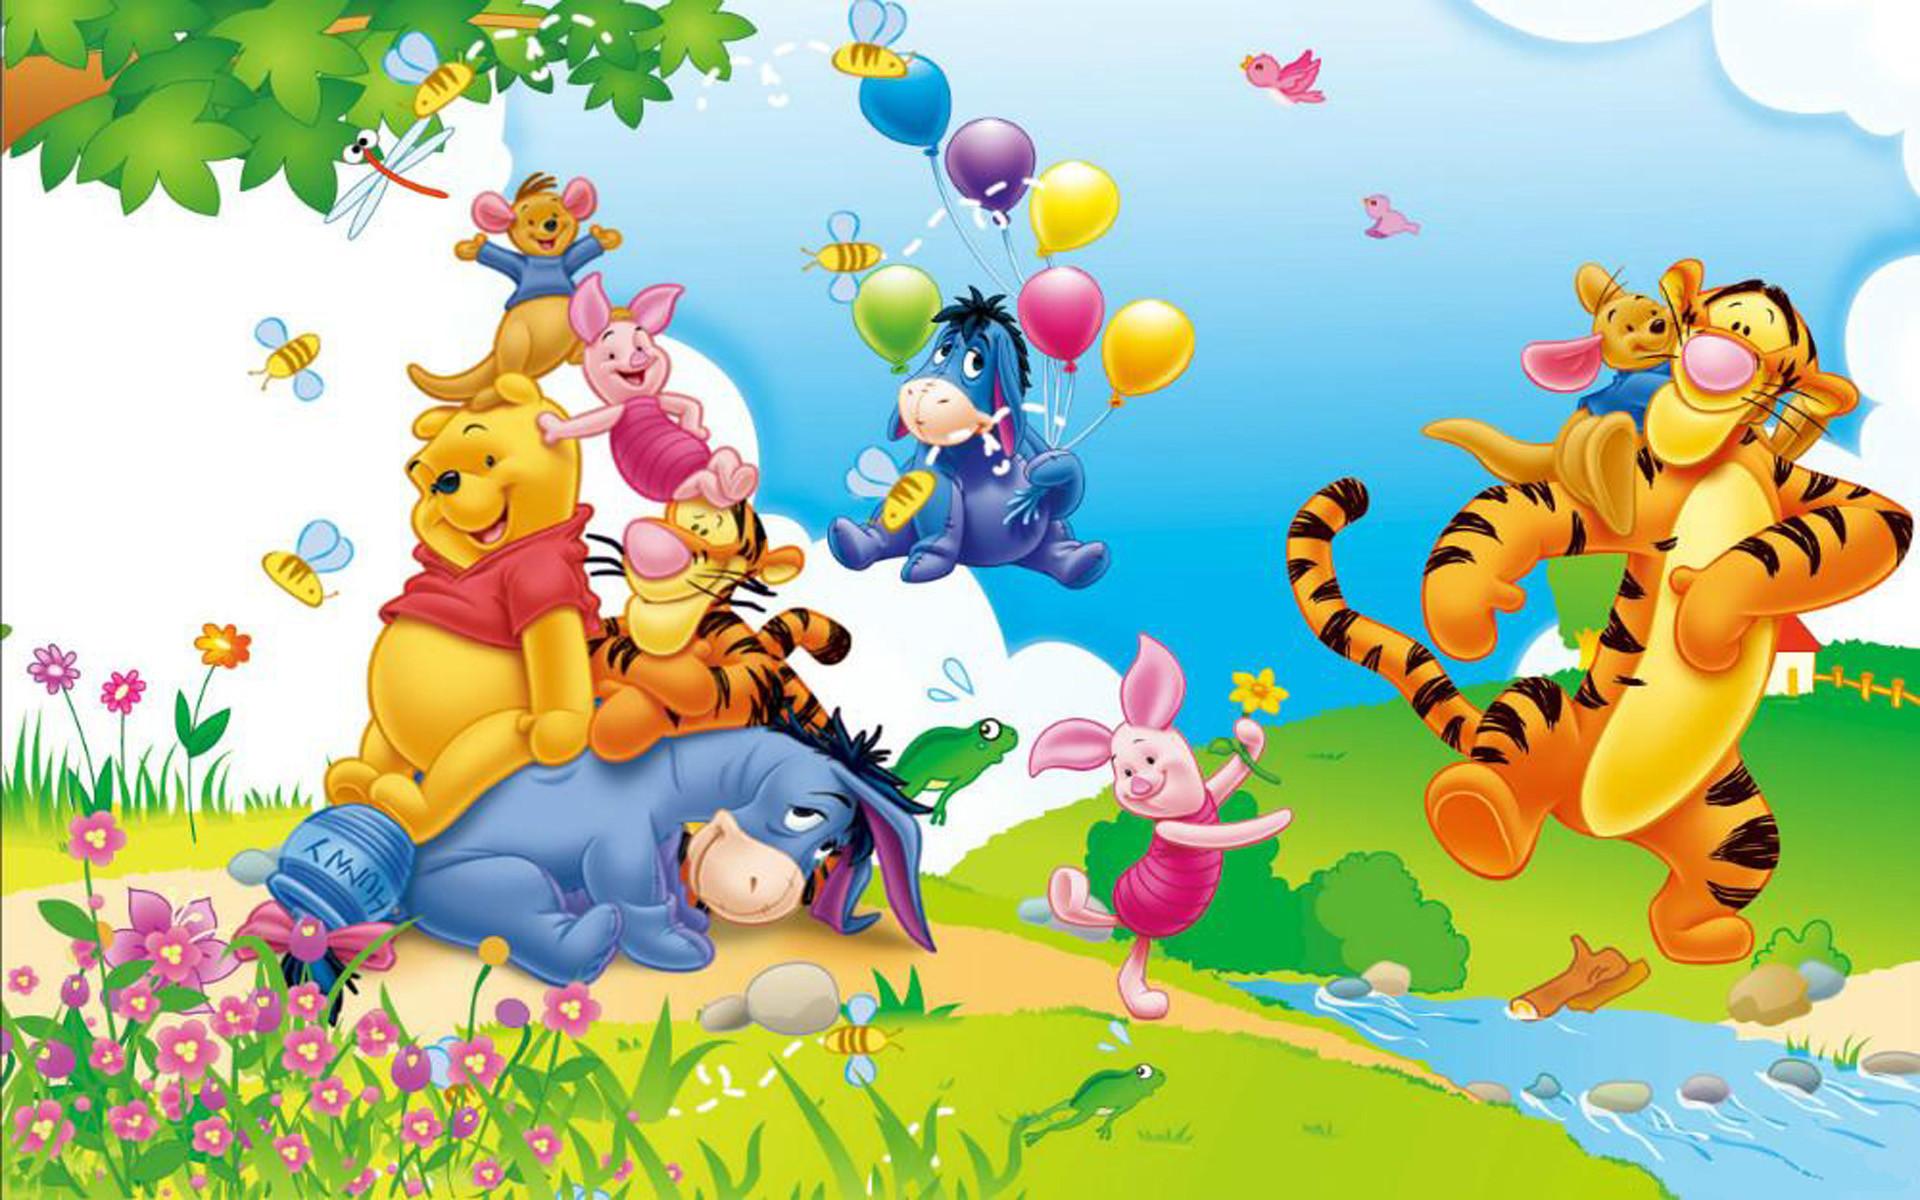 Wallpaper pooh bear 1920x1440 winnie pooh wallpaper quotes wallpaper simplepict com pooh bear wallpapers 64 images voltagebd Images